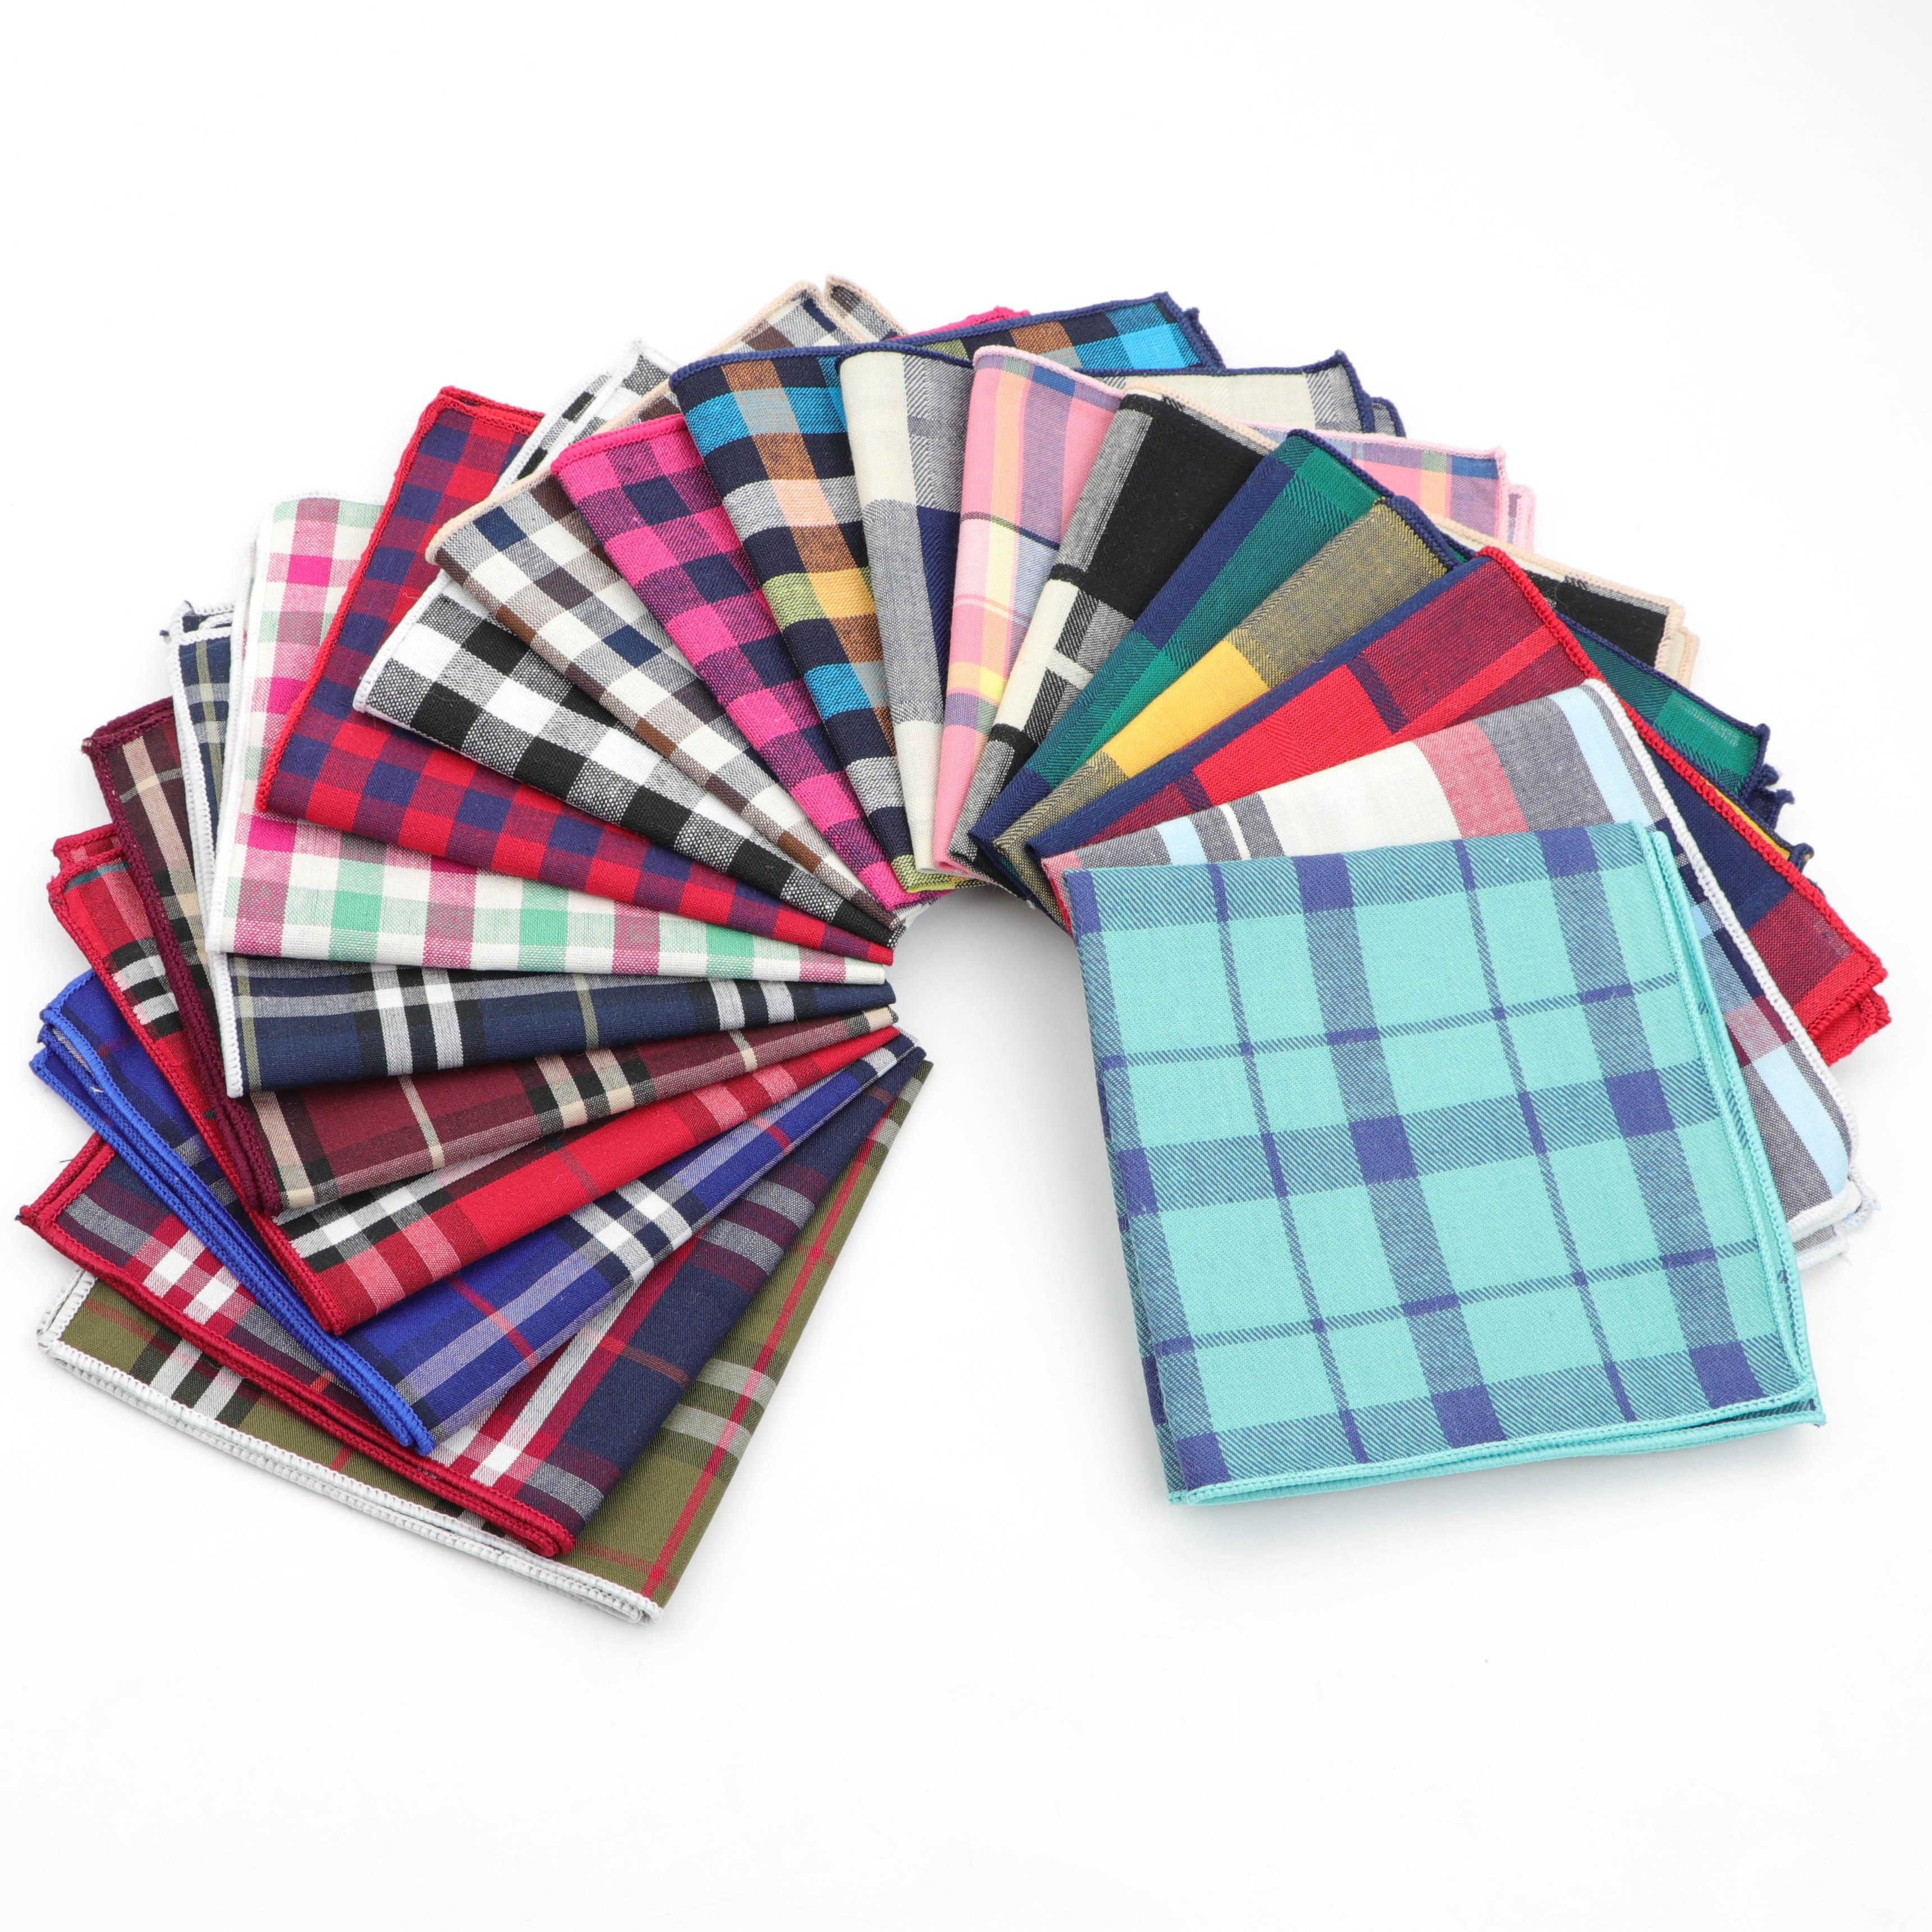 Striped Handkerchief Scarves Vintage Cotton Hankies Plaid Men's Pocket Square Printed Handkerchiefs